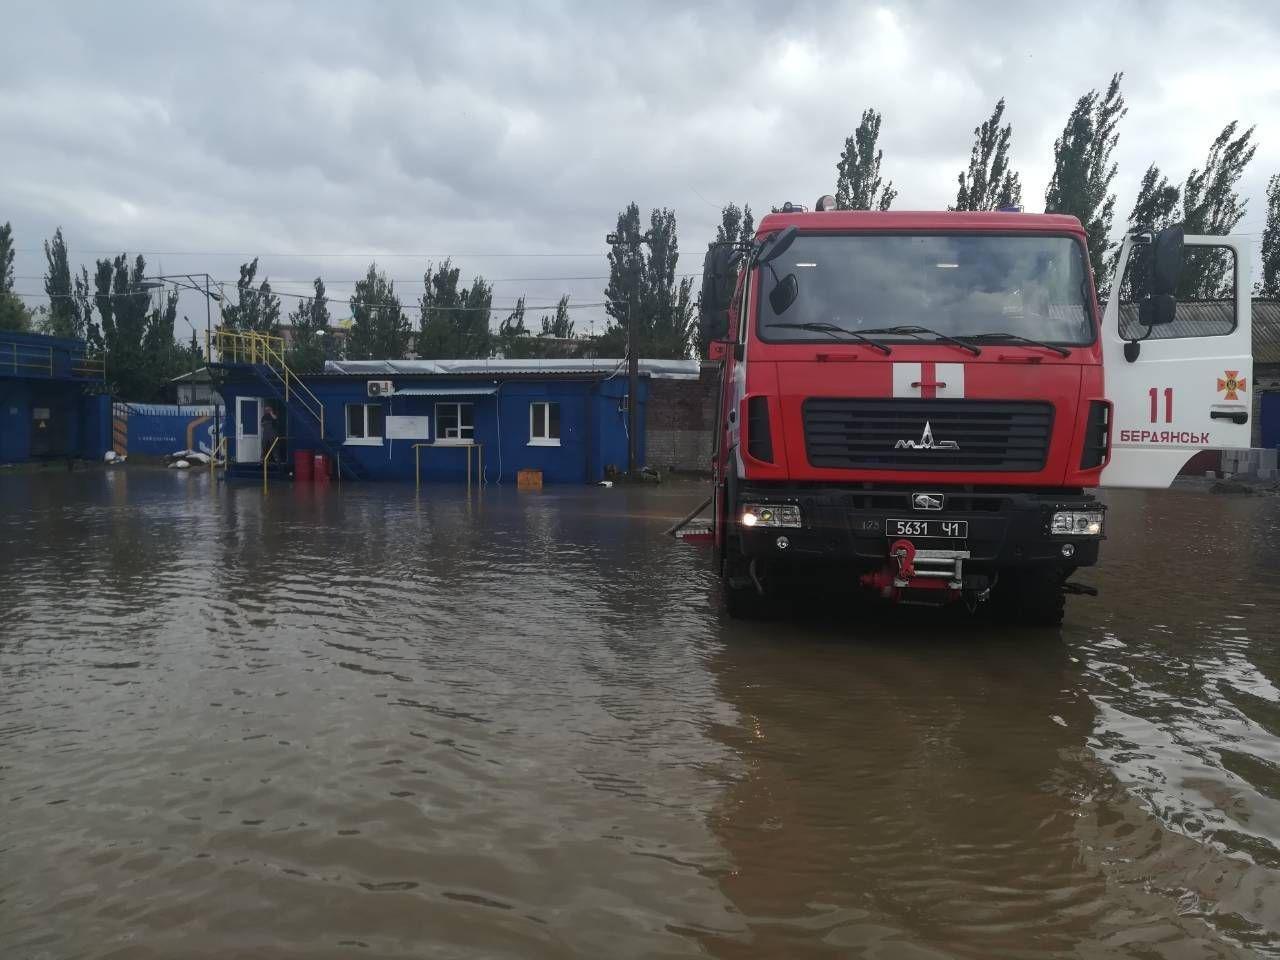 В Бердянске после затопления без света остались два района, - ФОТО, фото-1